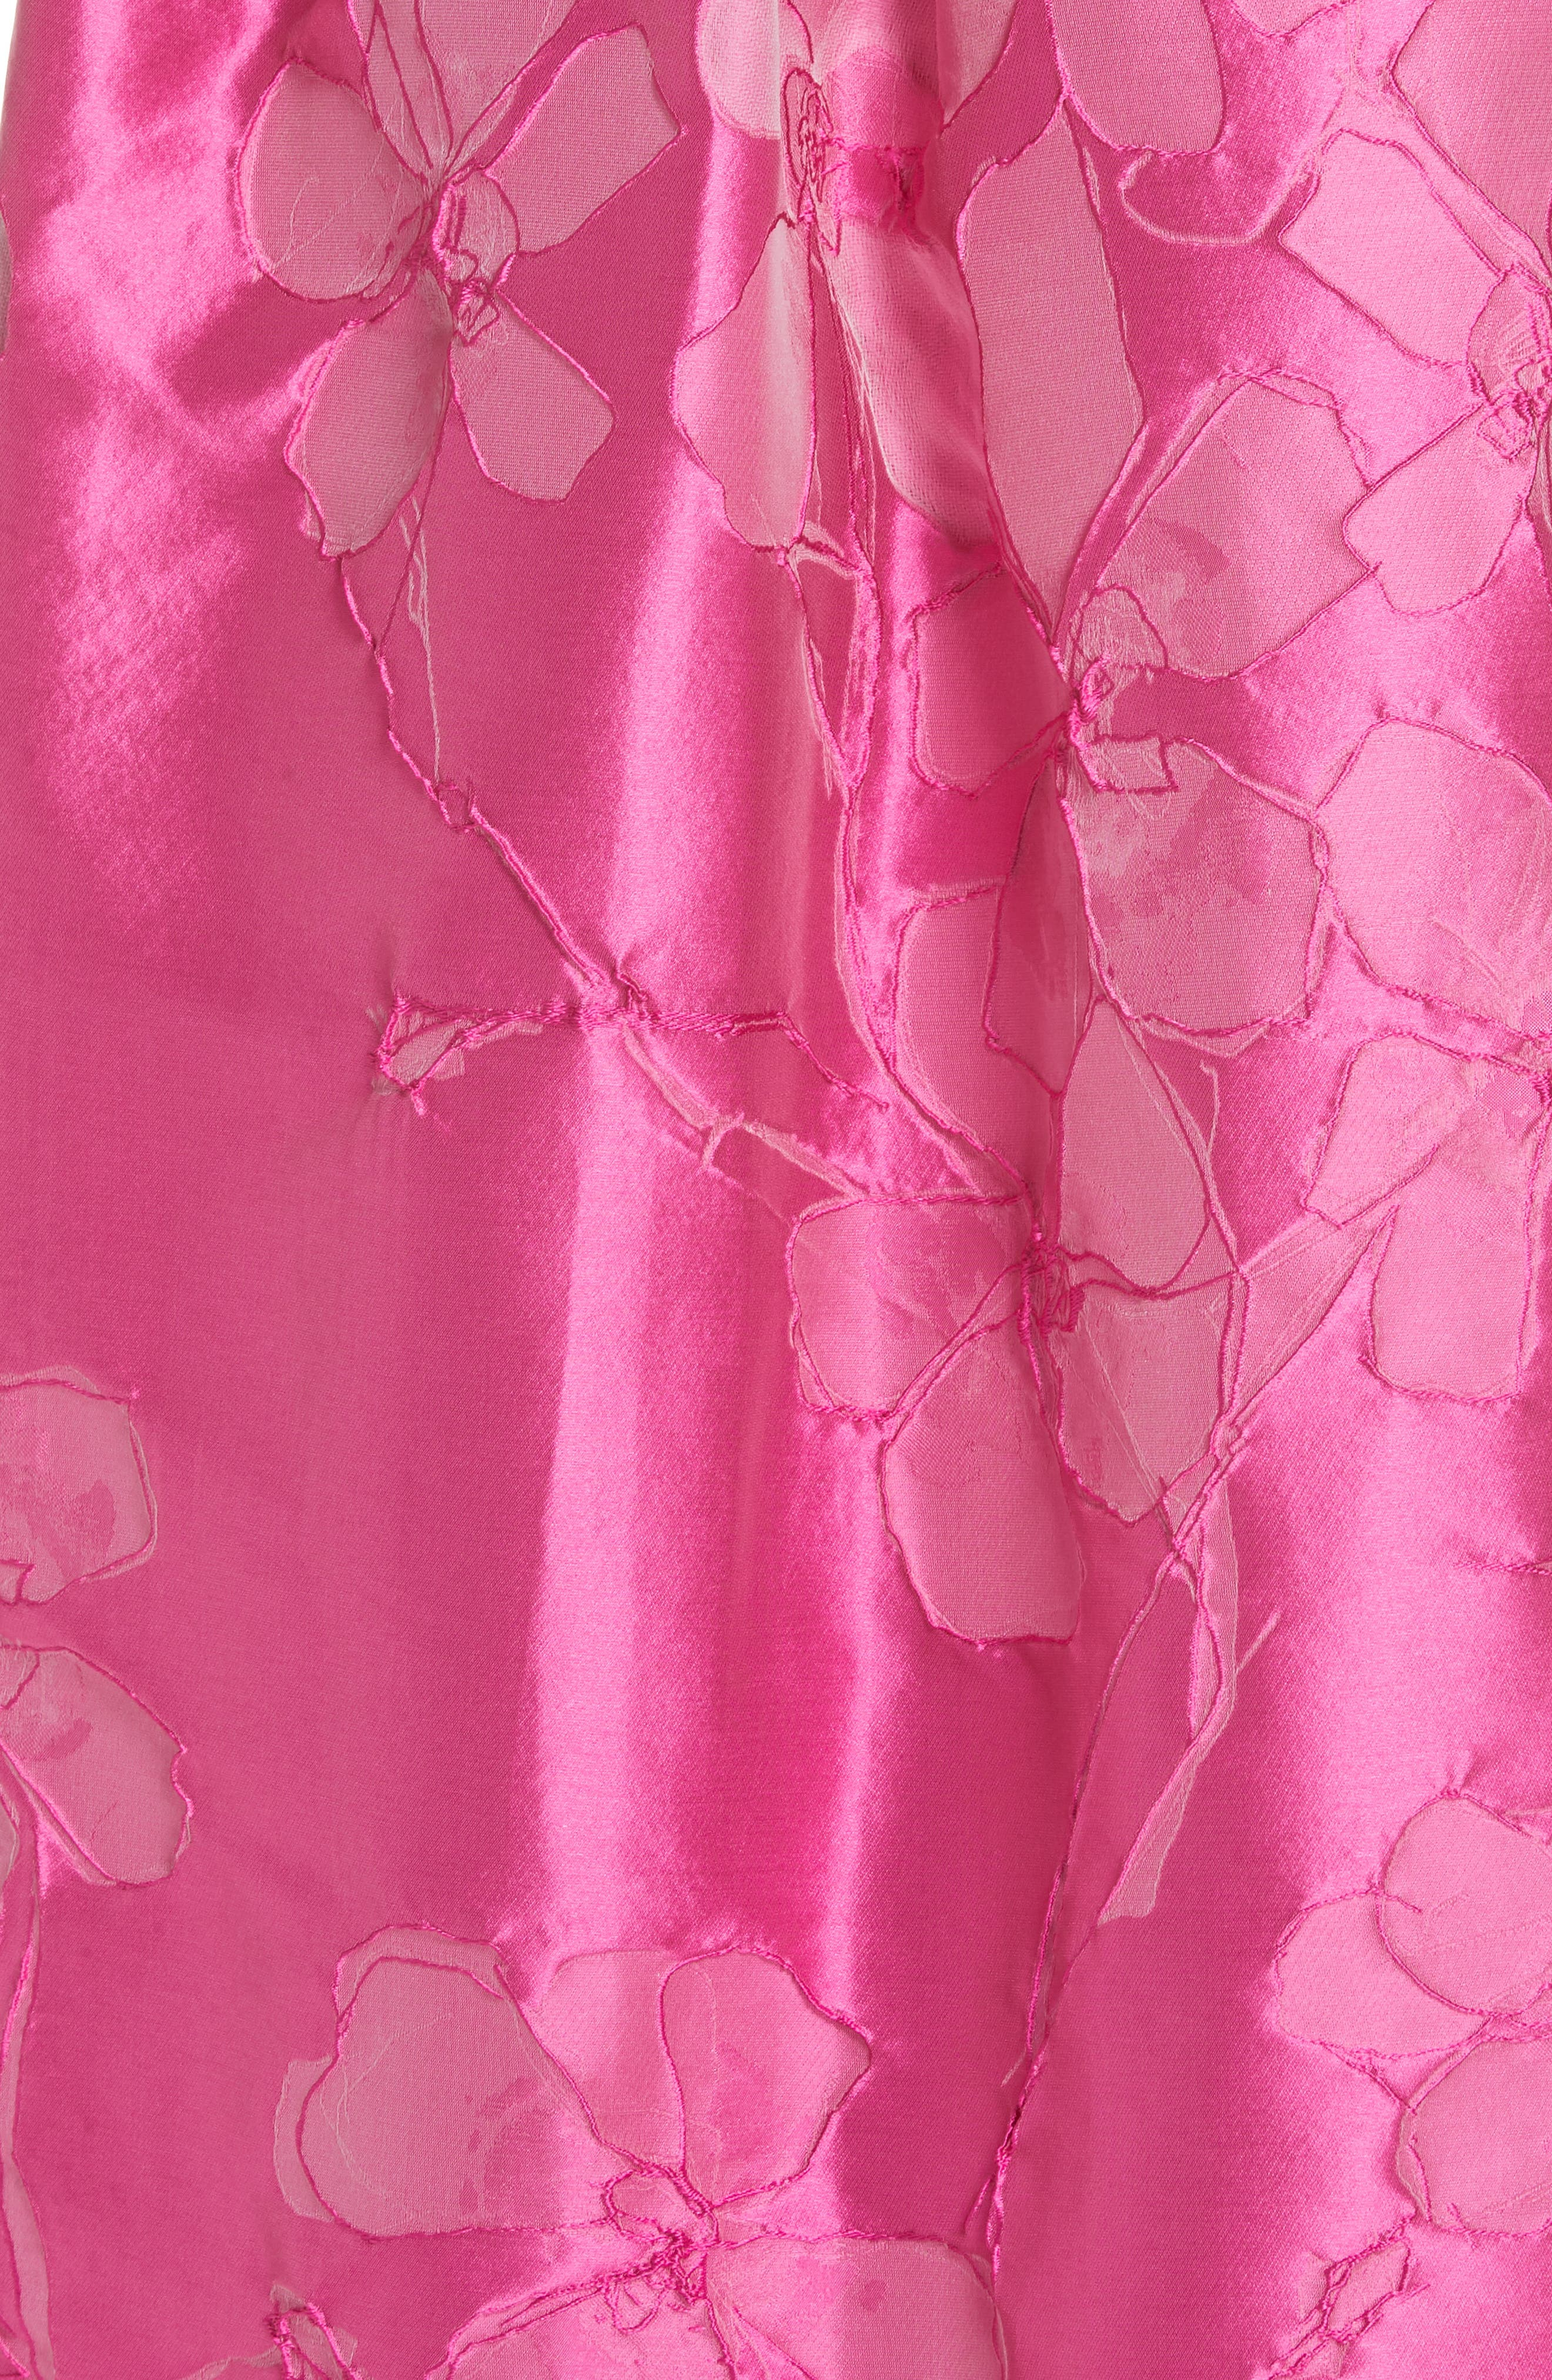 TALBOT RUNHOF,                             Floral V-Neck Evening Dress,                             Alternate thumbnail 6, color,                             FUCHSIA PINK